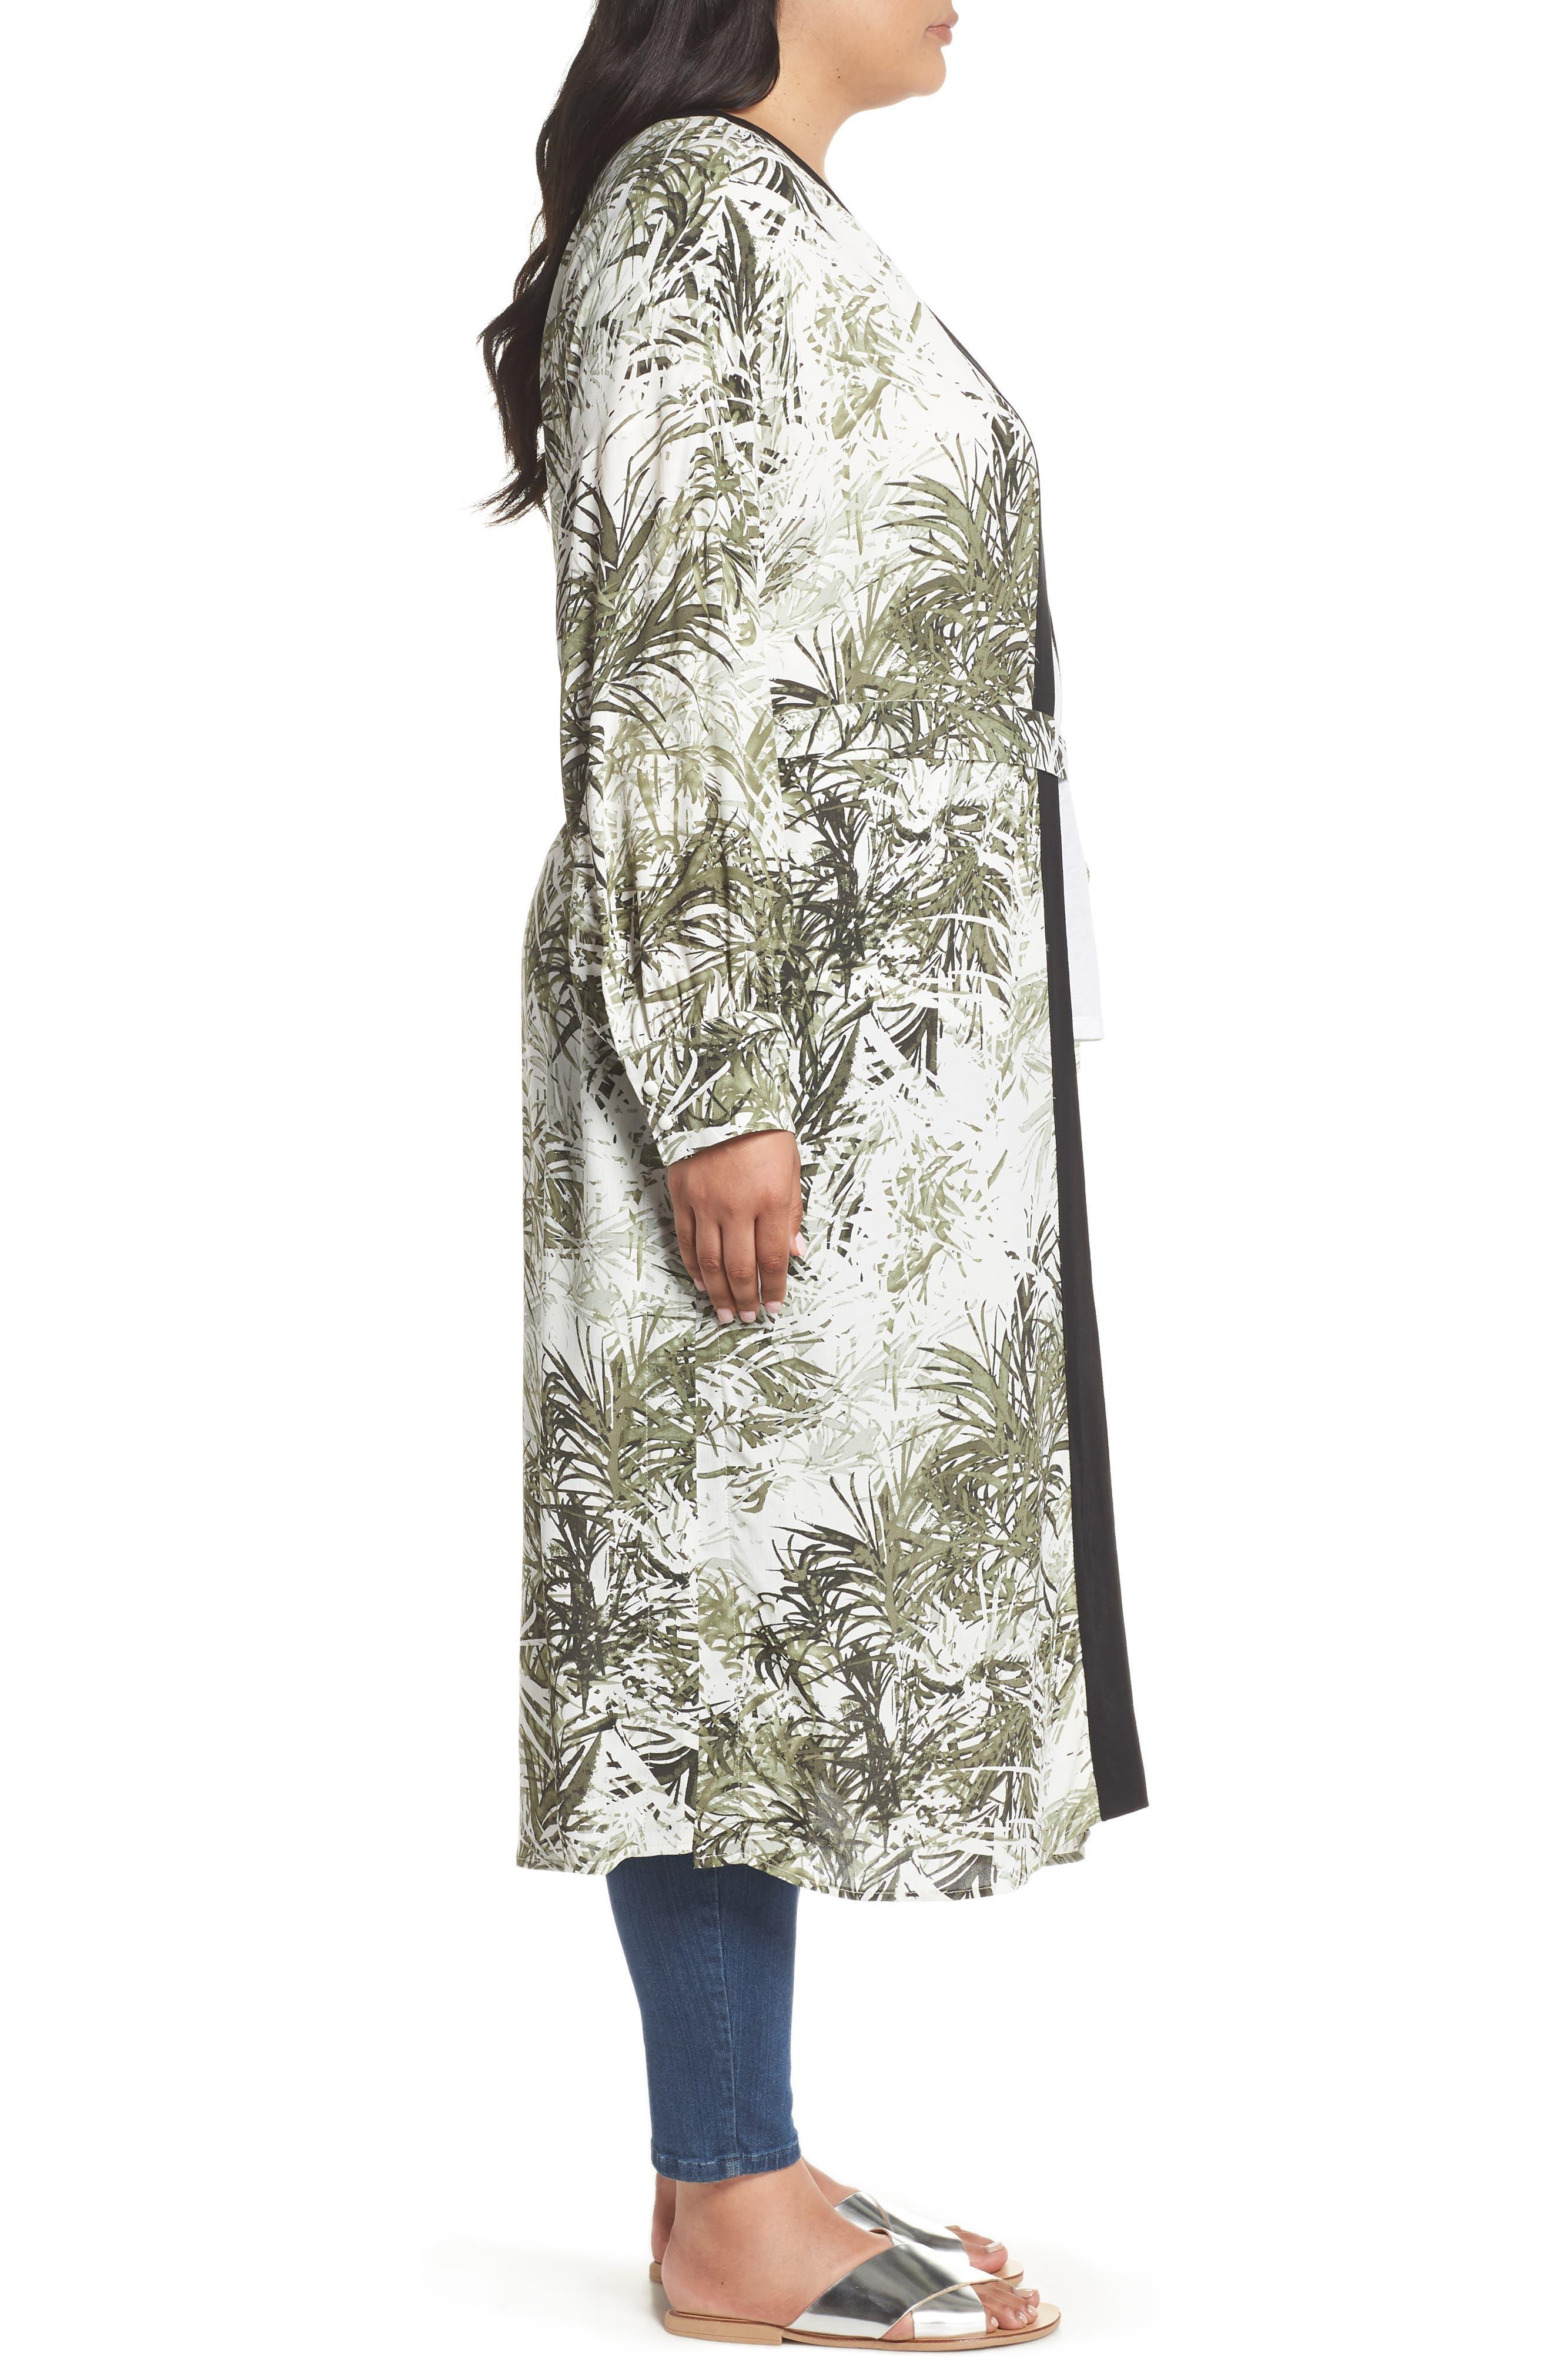 Calico Kimono,                             Alternate thumbnail 4, color,                             306